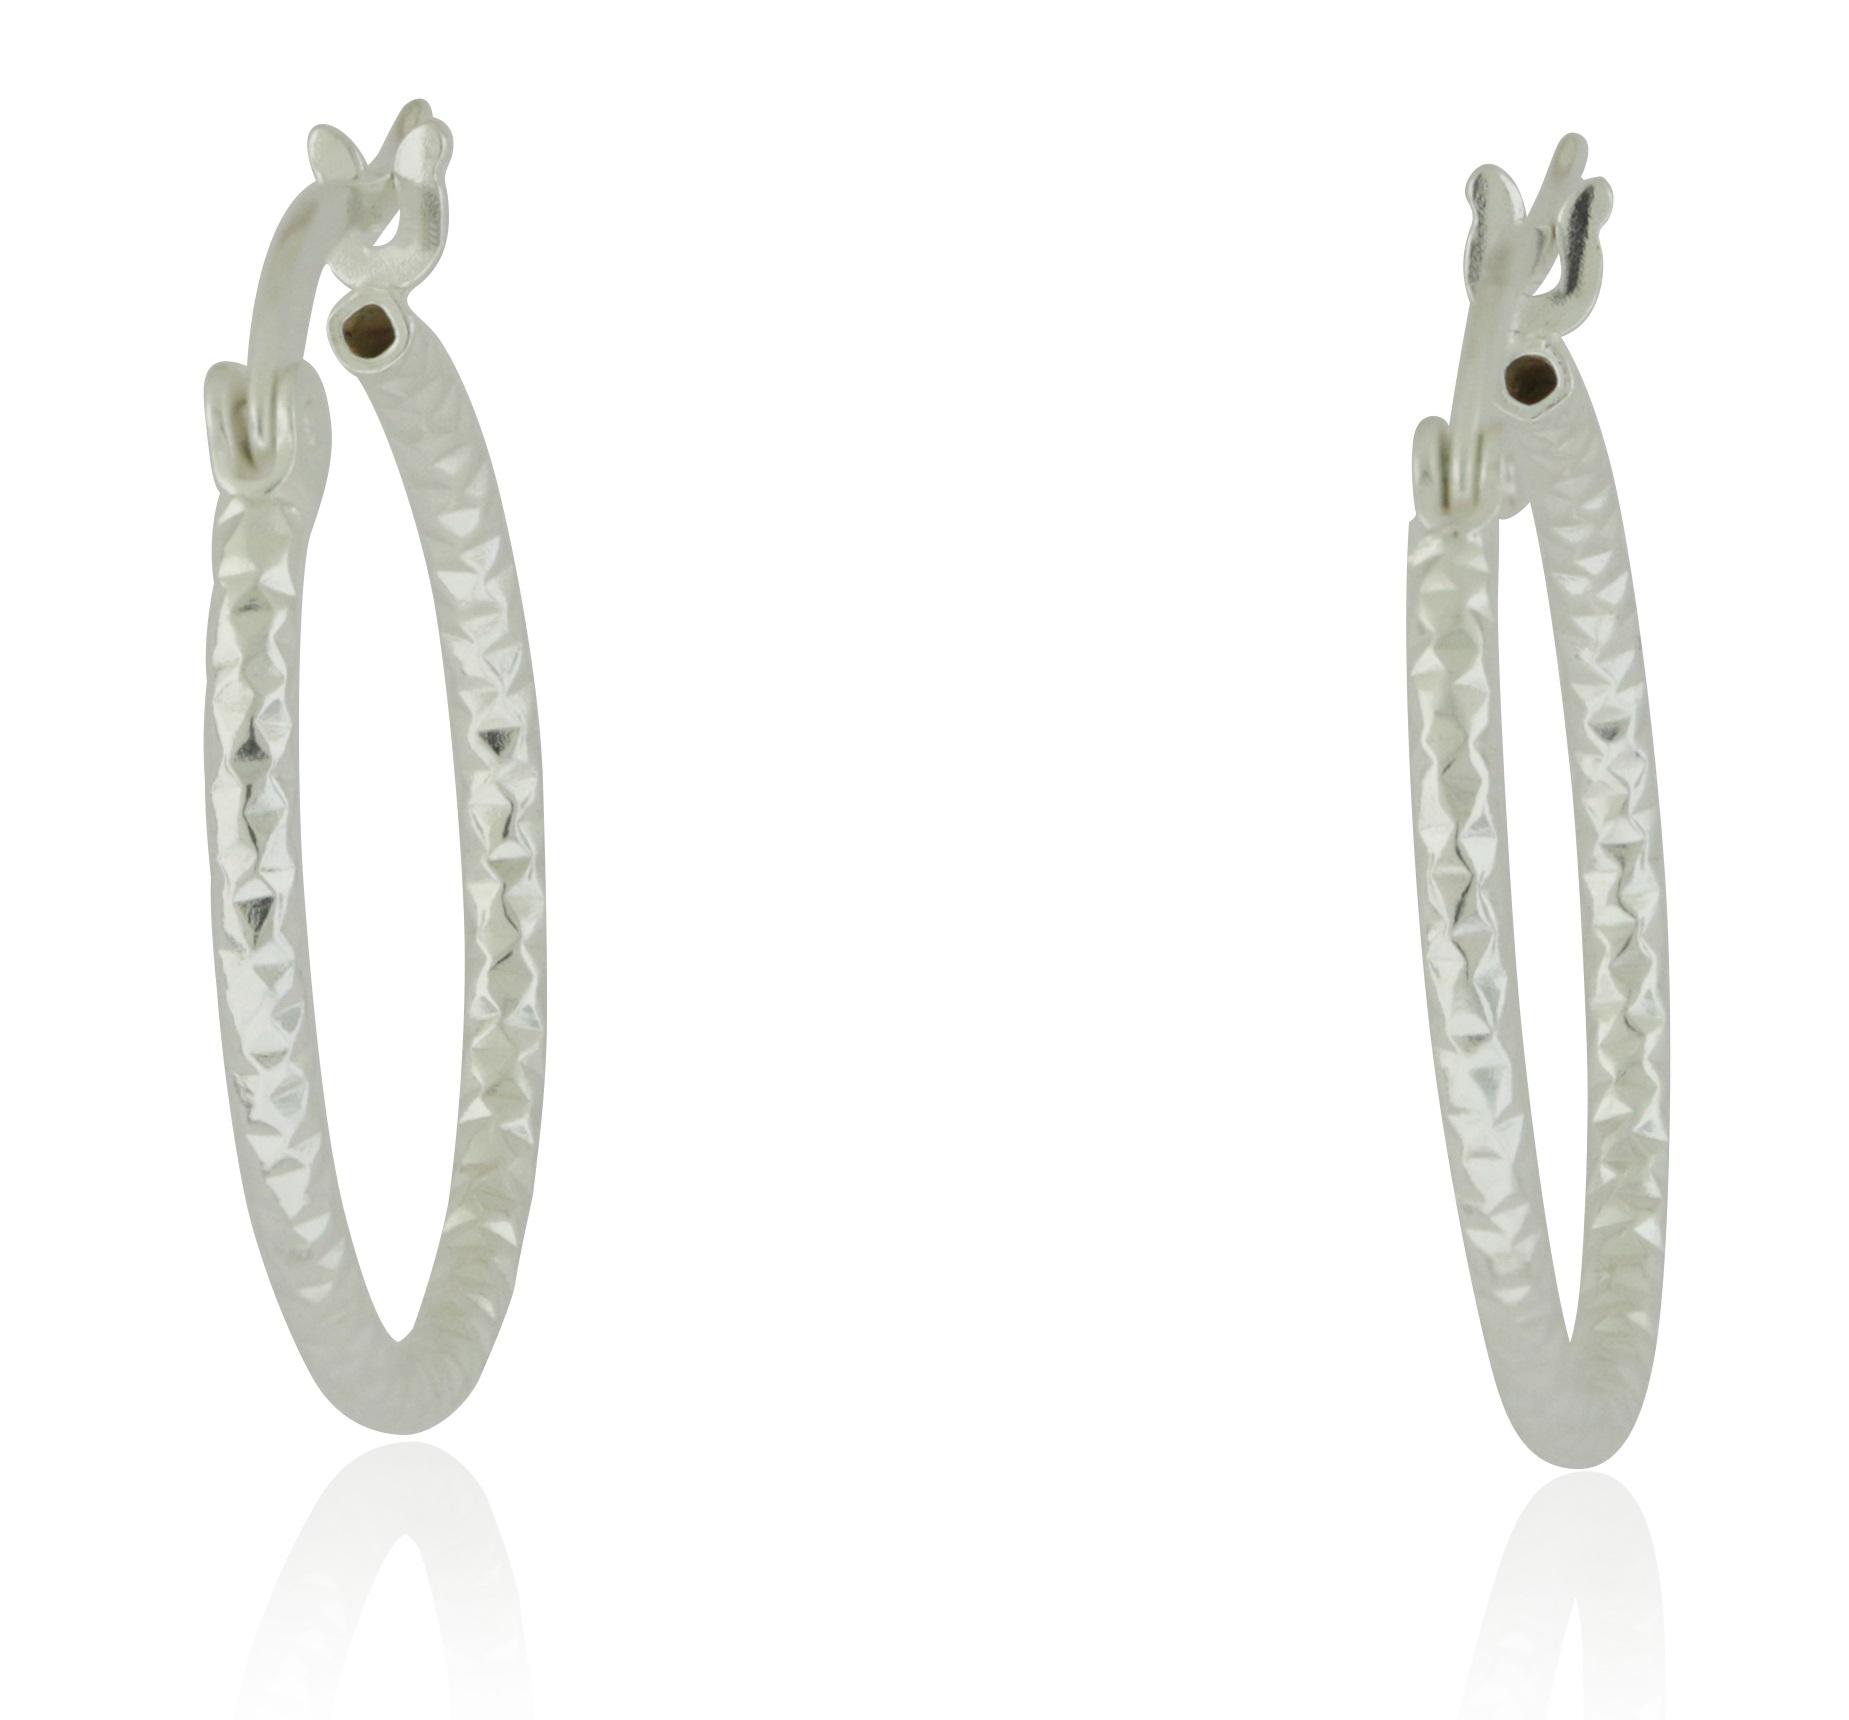 DC Hoop Earrings - JE1805